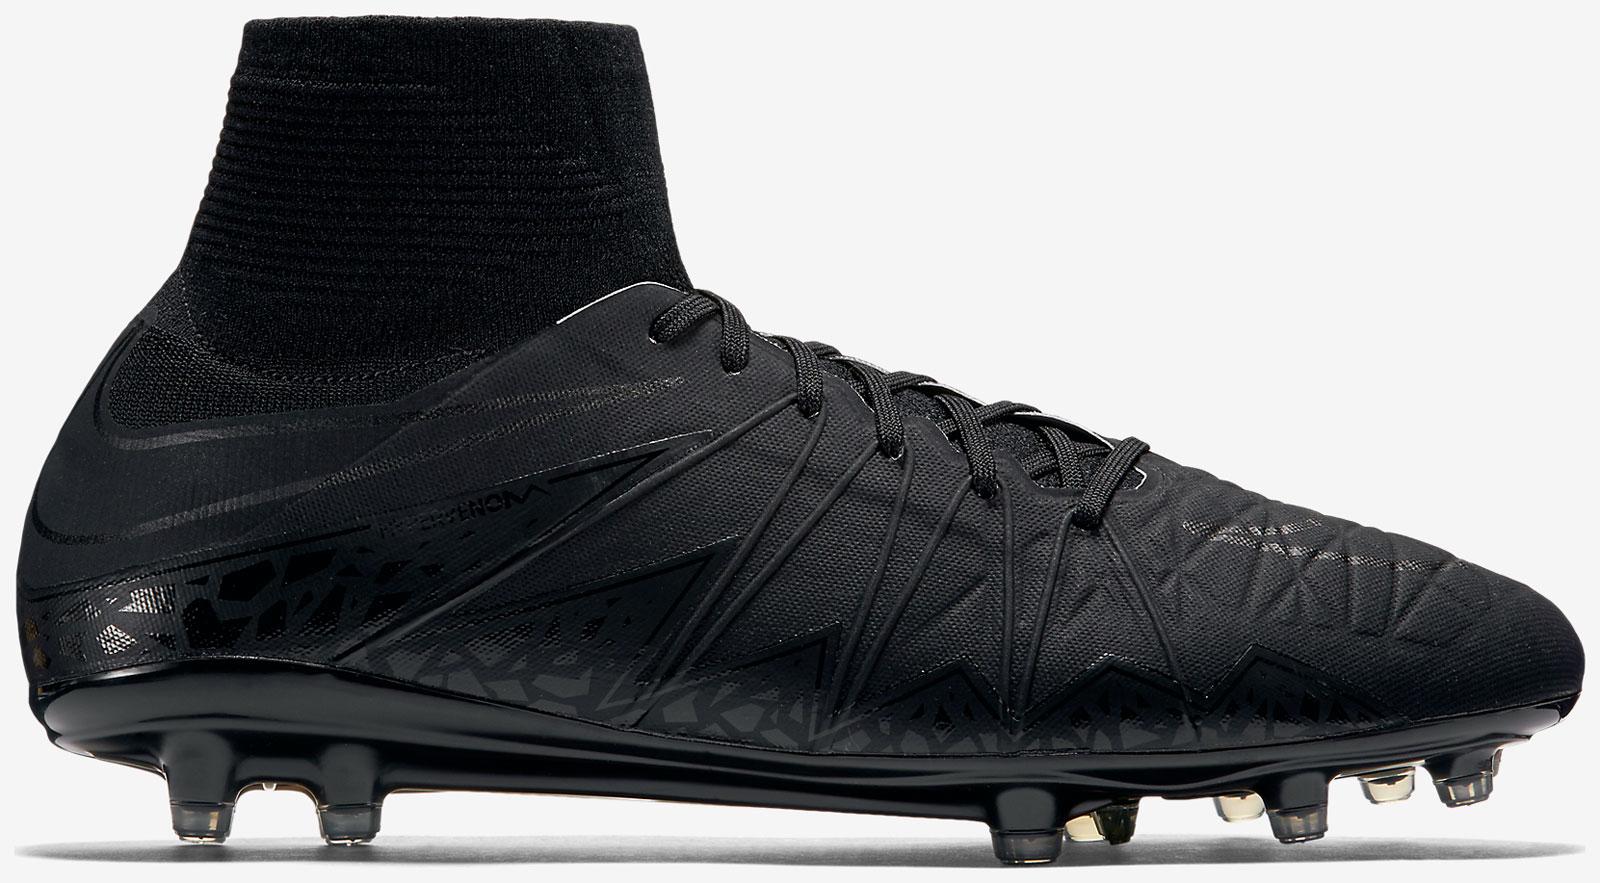 Nike Hypervenom All Black Nike 2015-2016 Academy...